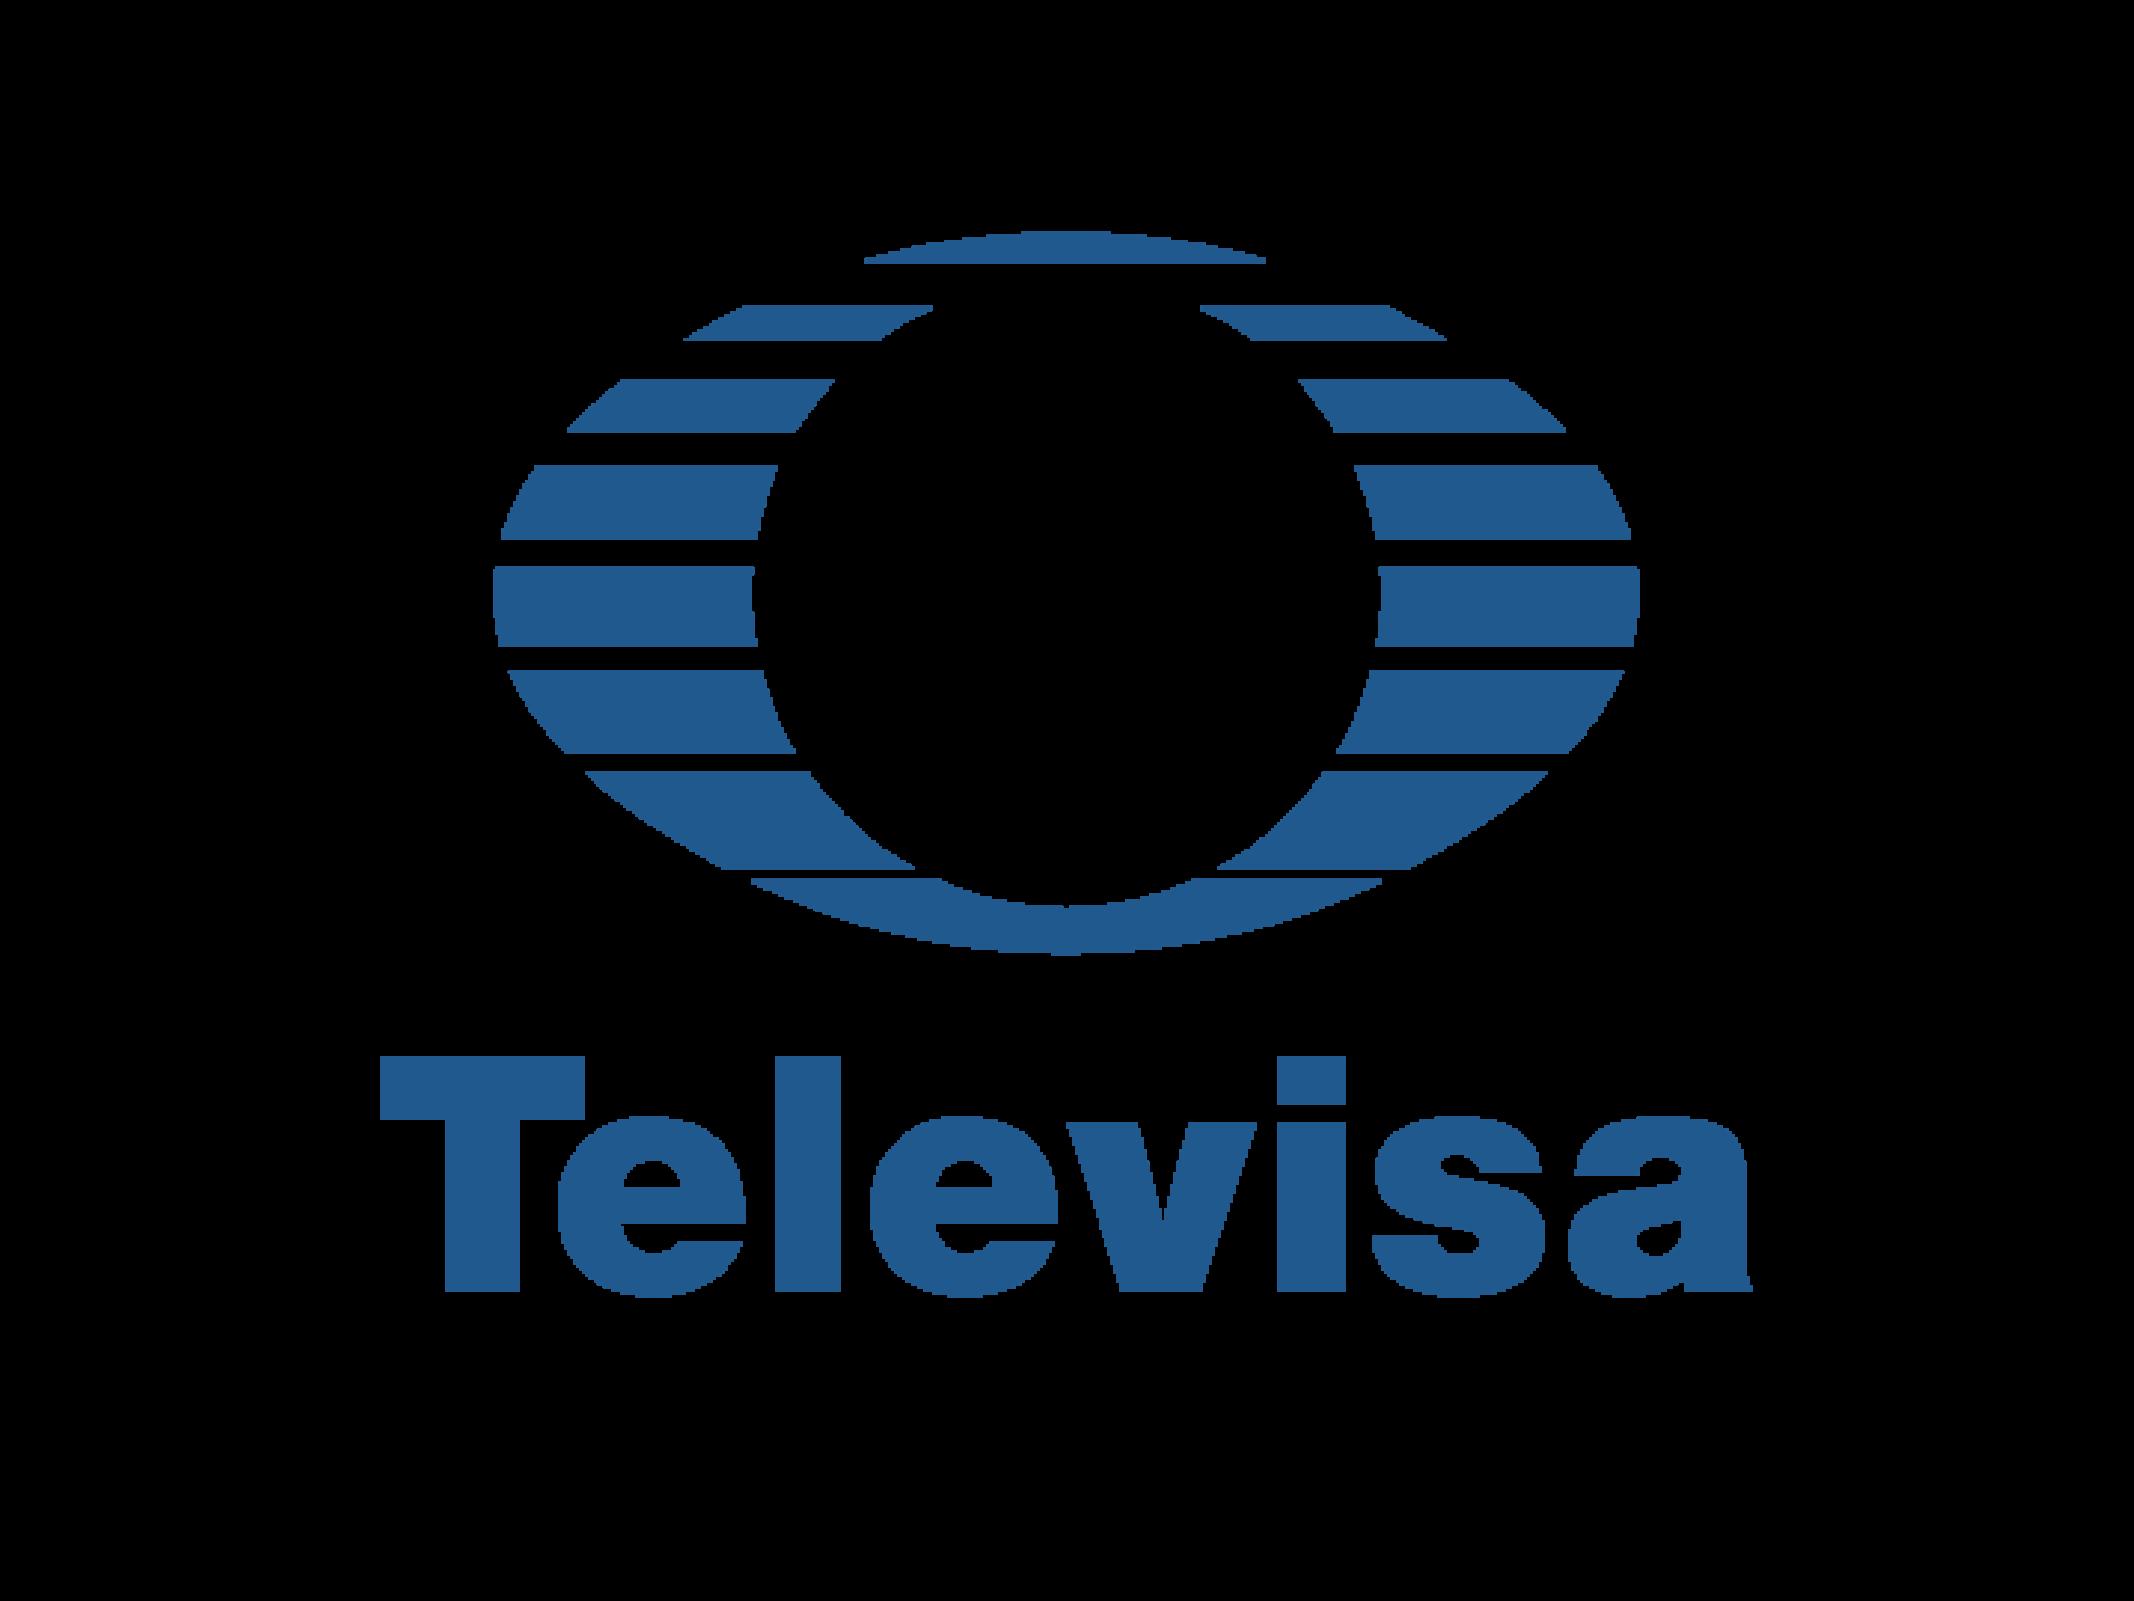 logo-clientes-televisa